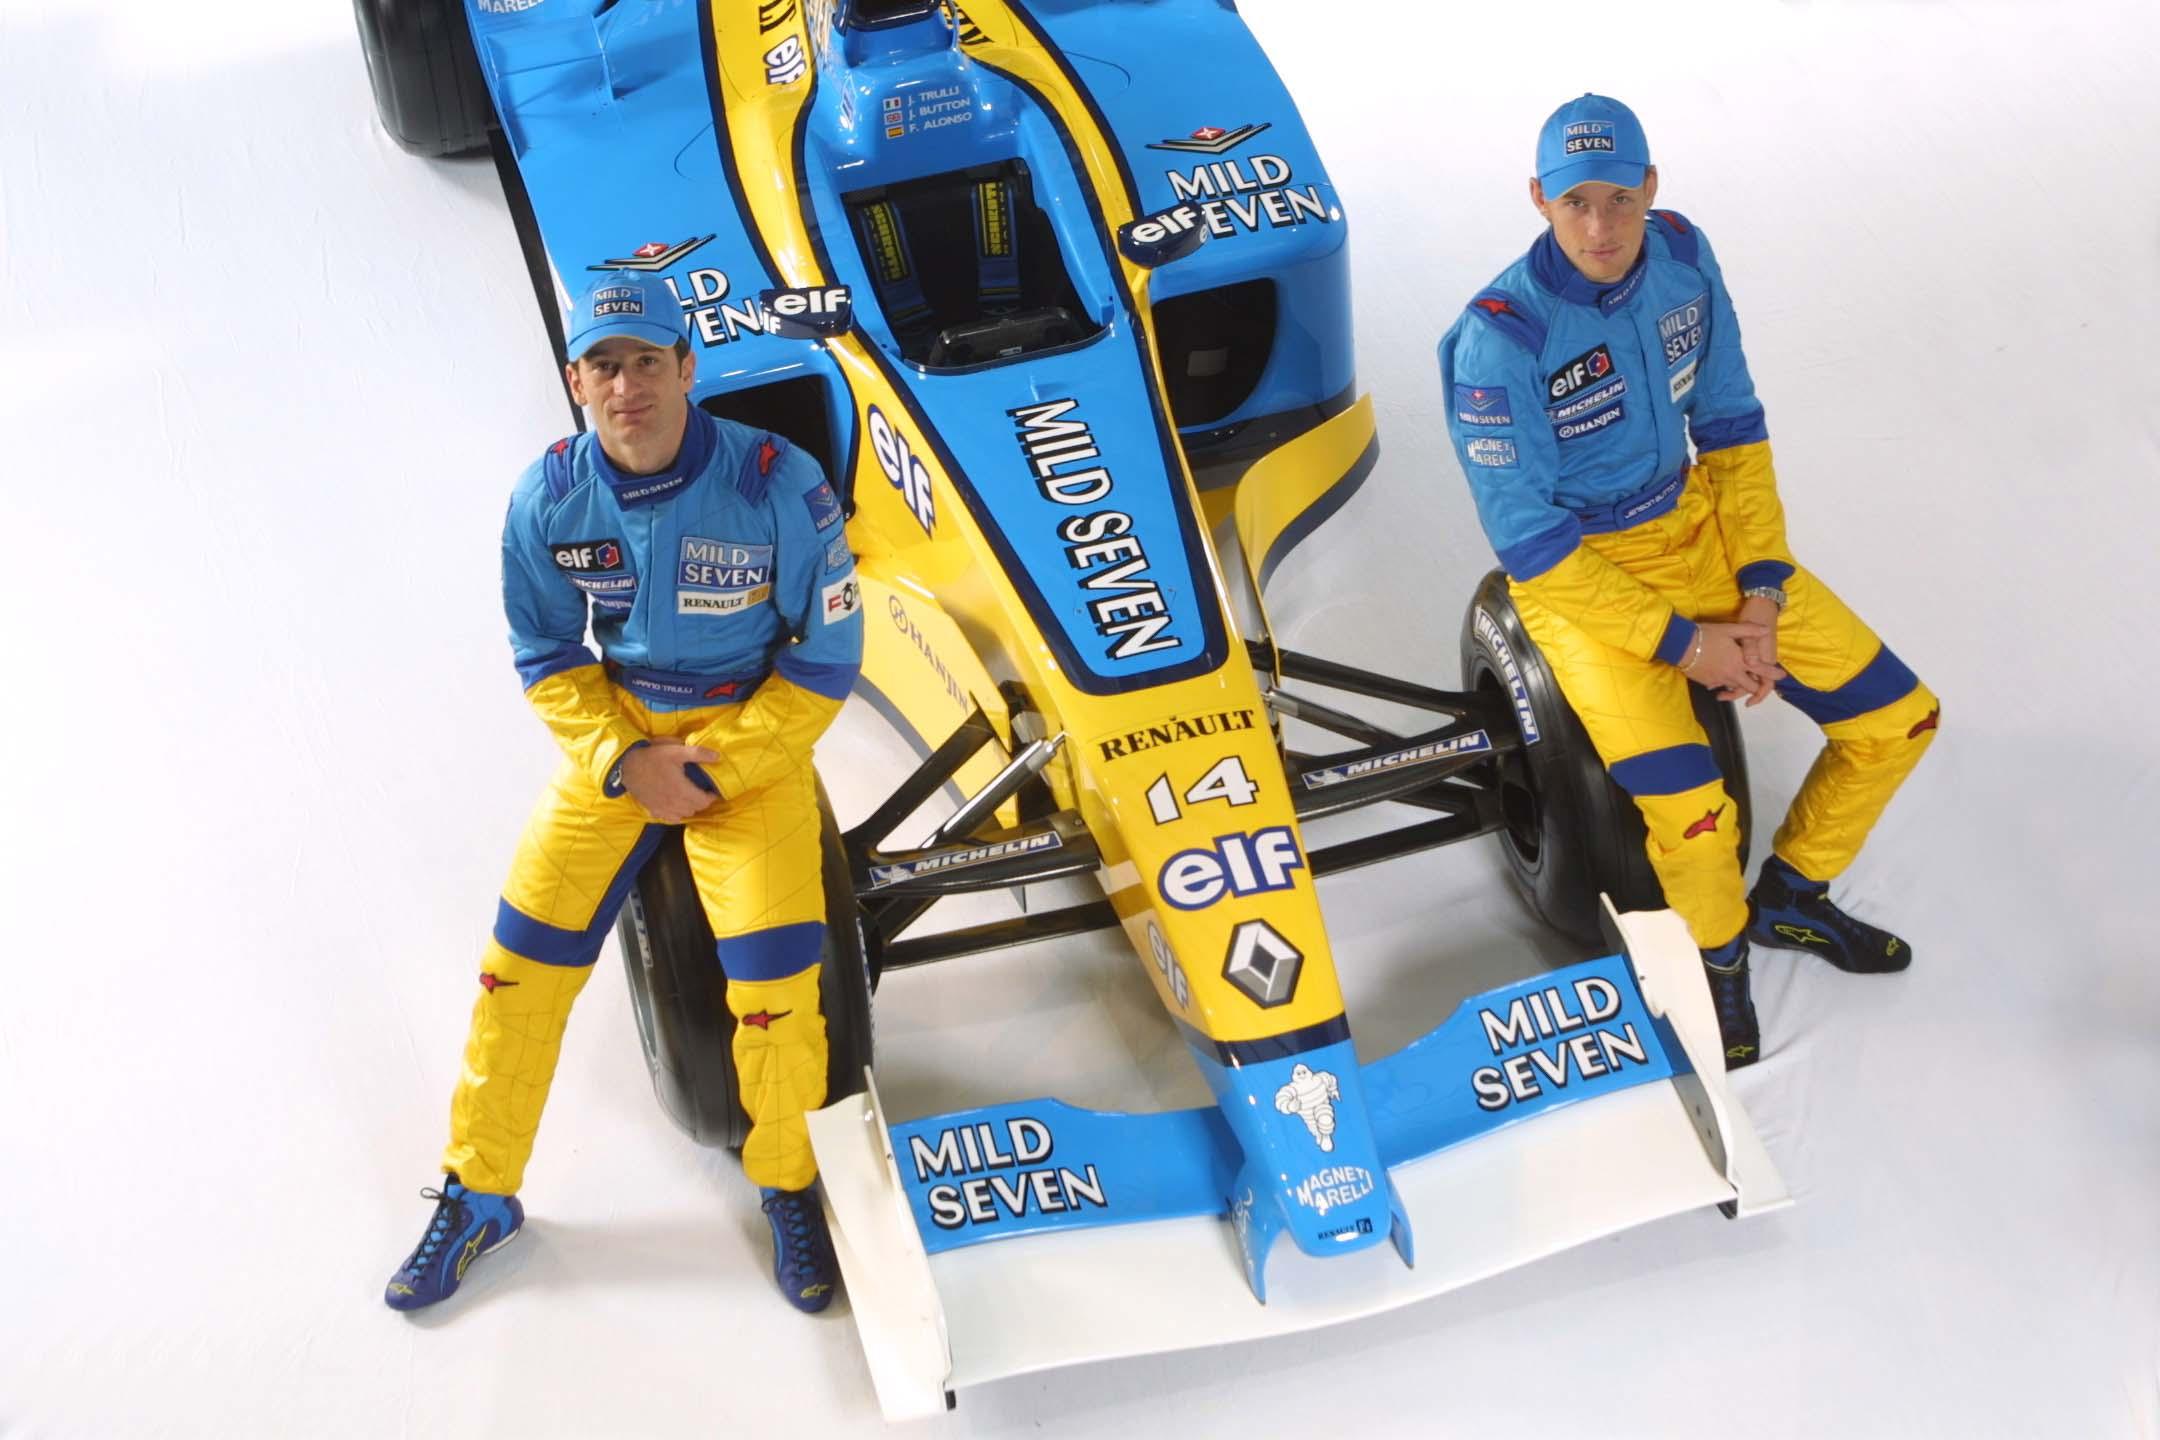 Hd Wallpapers 2005 Formula 1 Car Launches: HD Wallpapers 2002 Formula 1 Car Launches